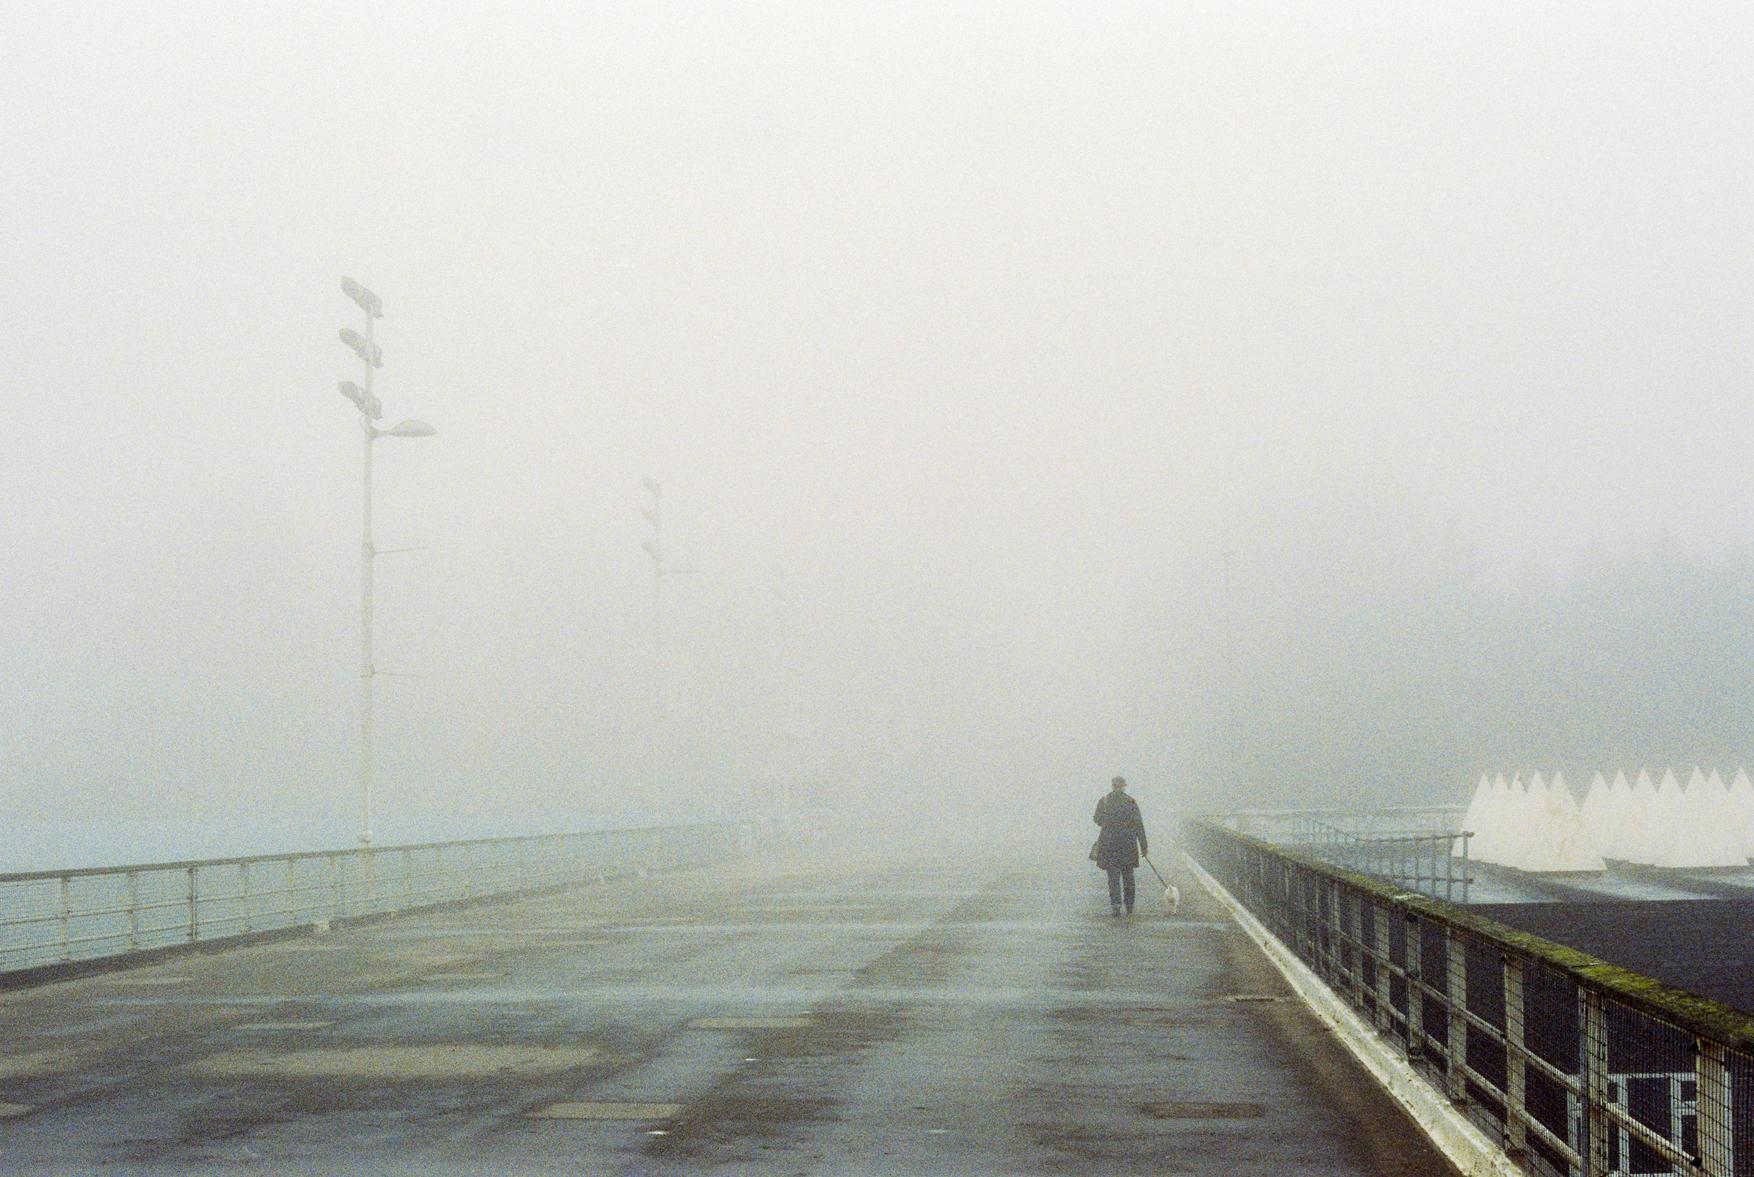 Crystal Palace Fog by Dmitry Serostanov